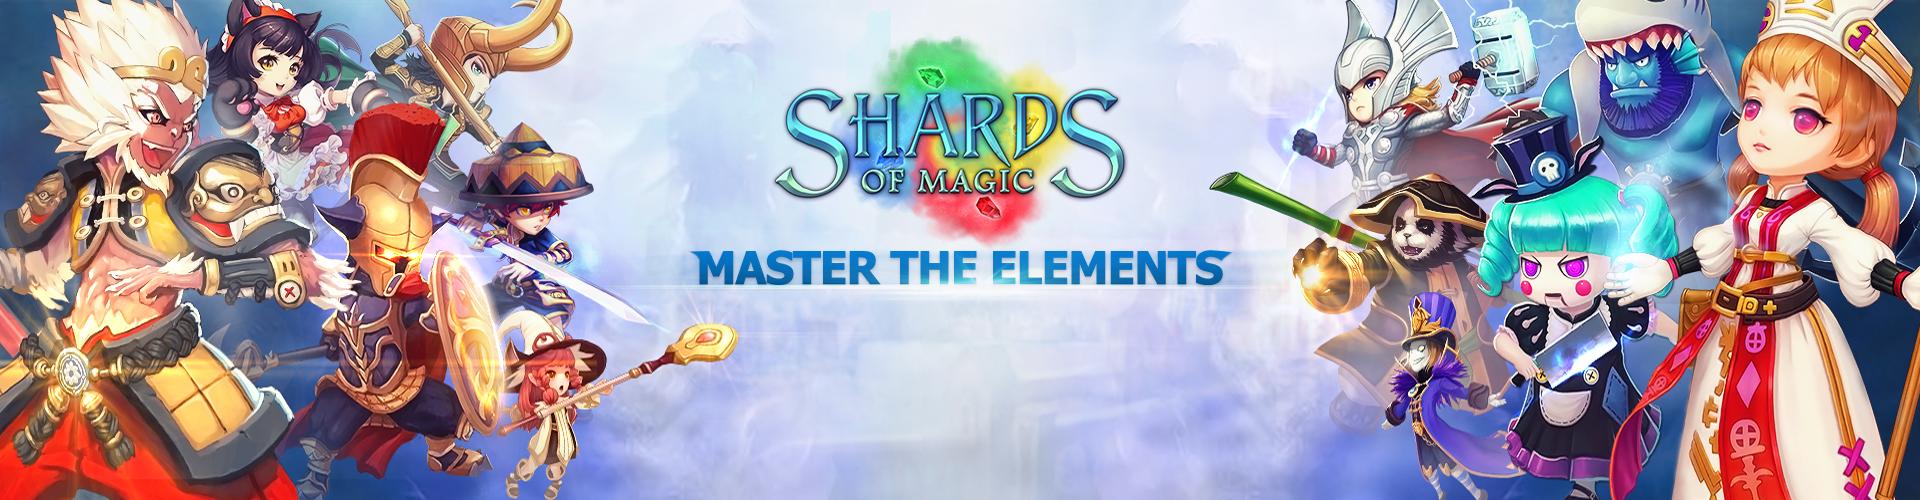 Shards of Magic